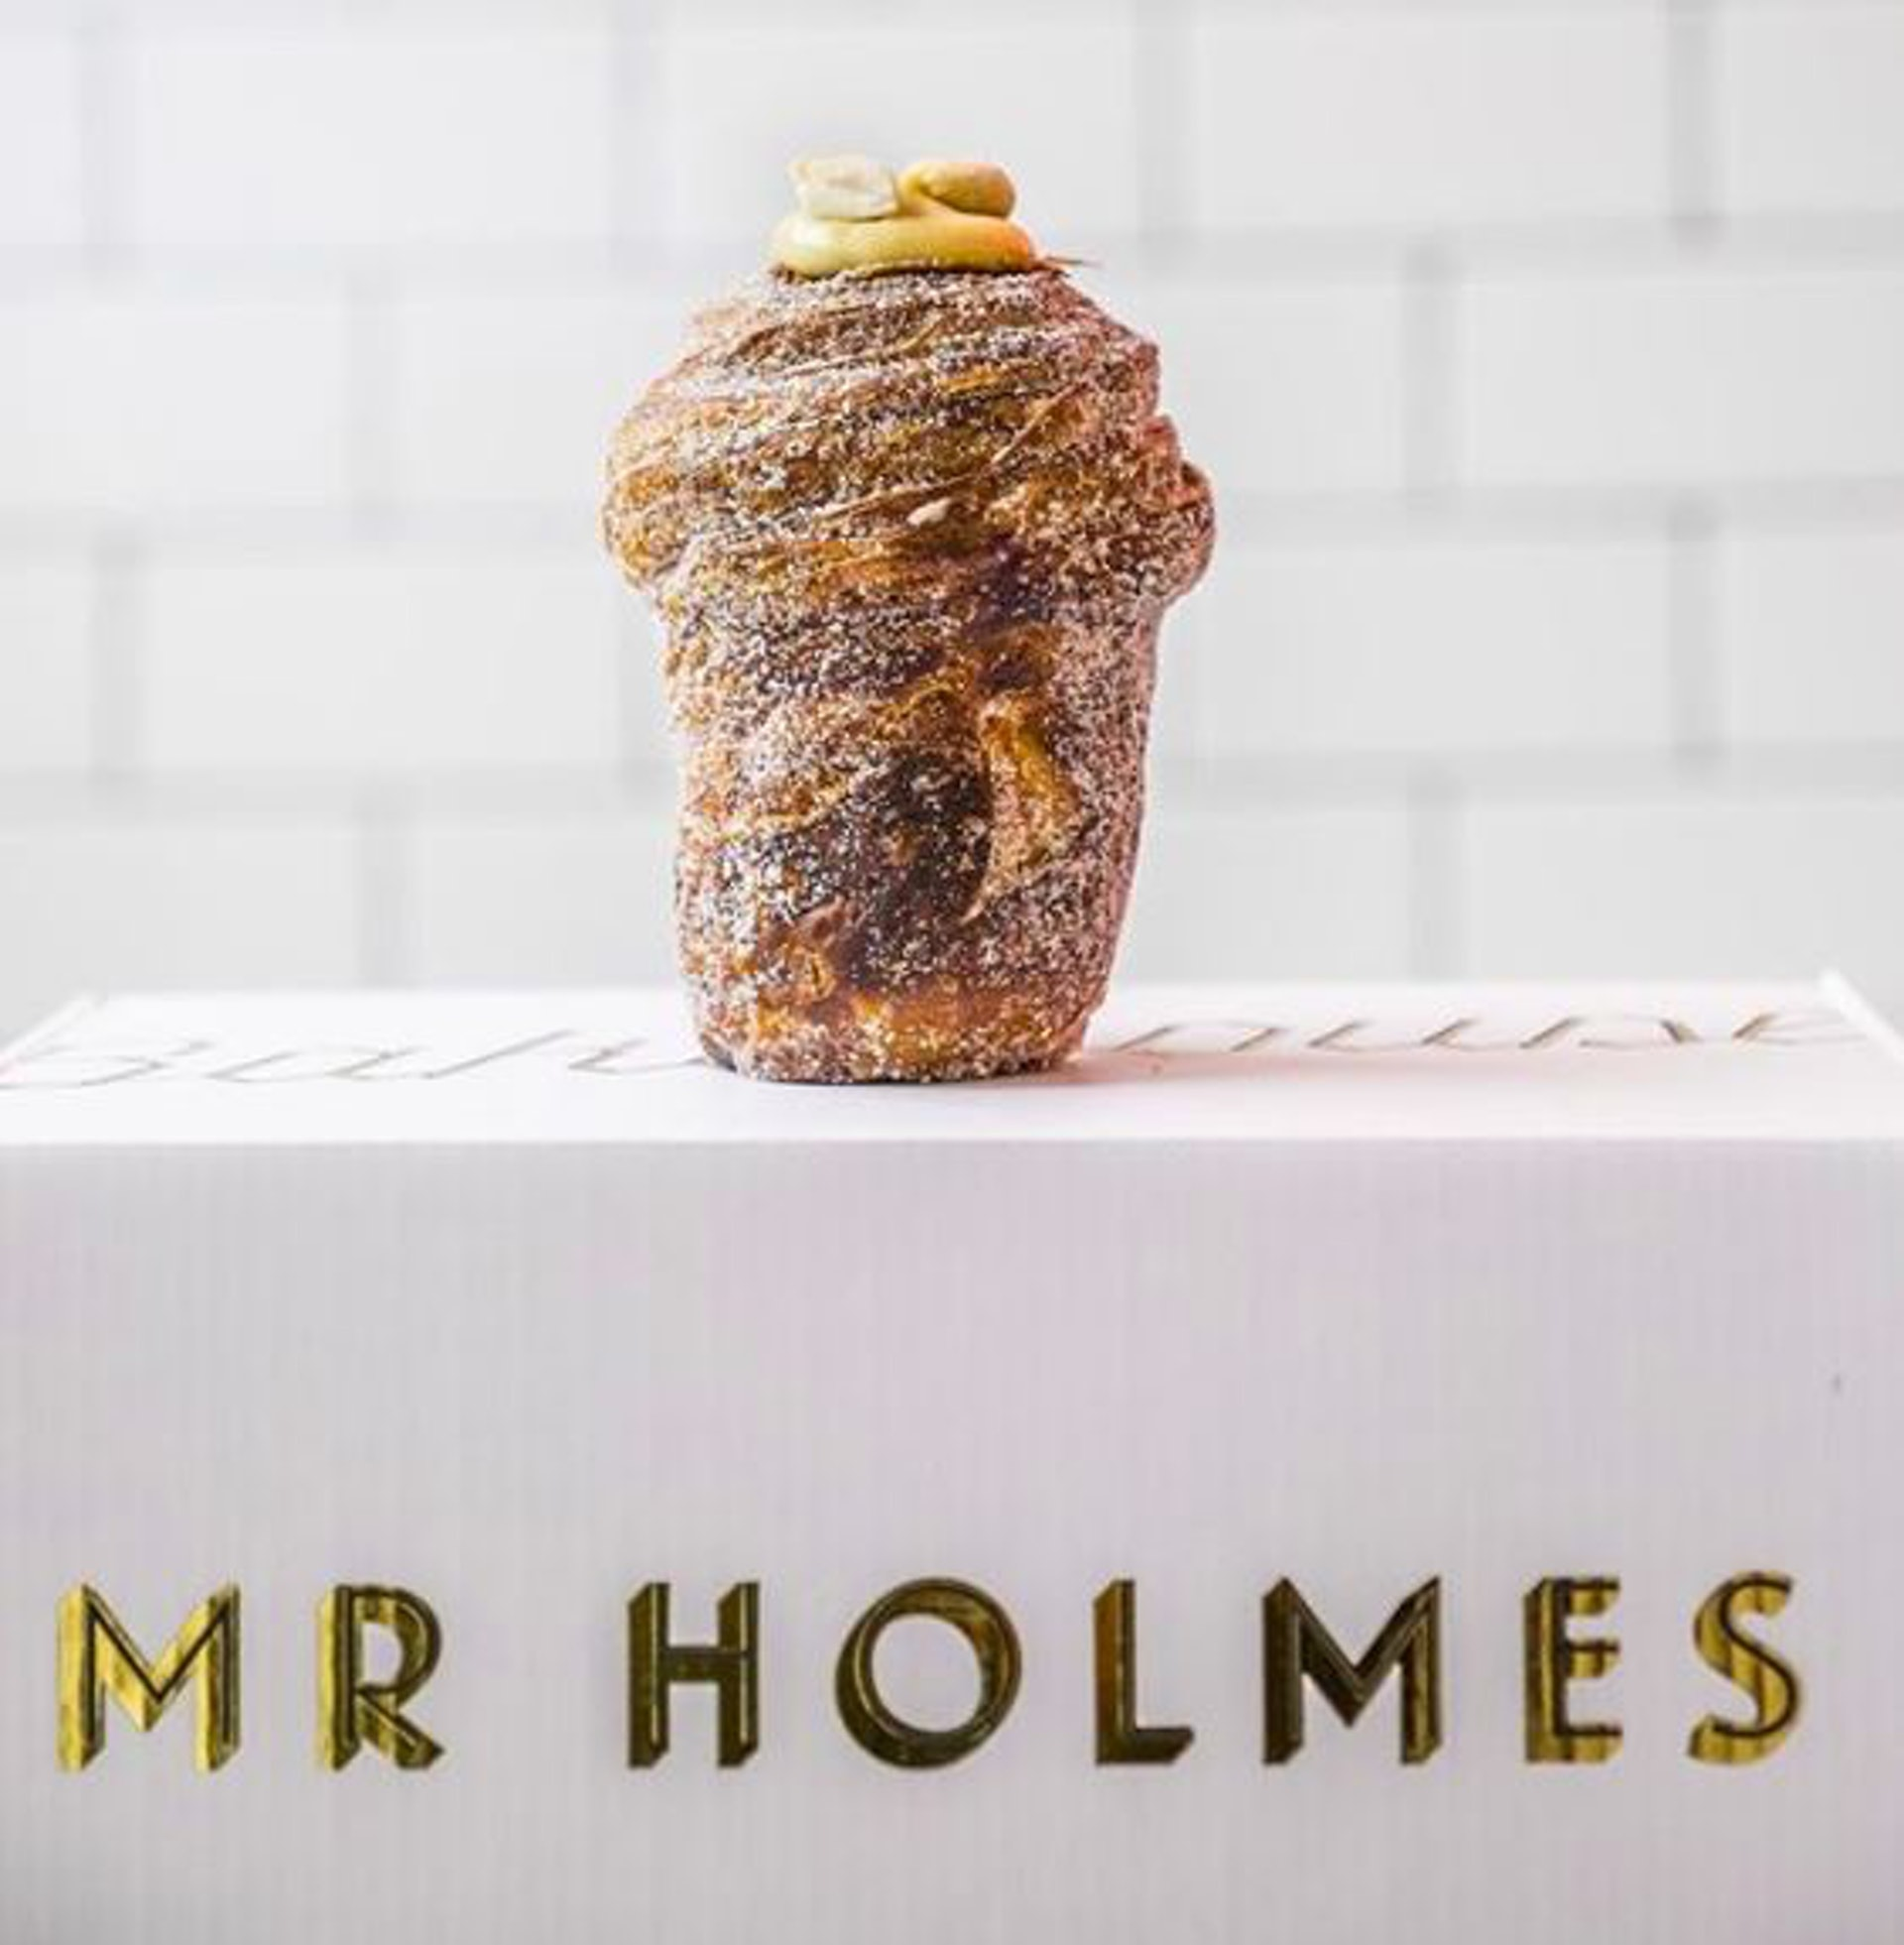 Mr. Holmes bakehouse